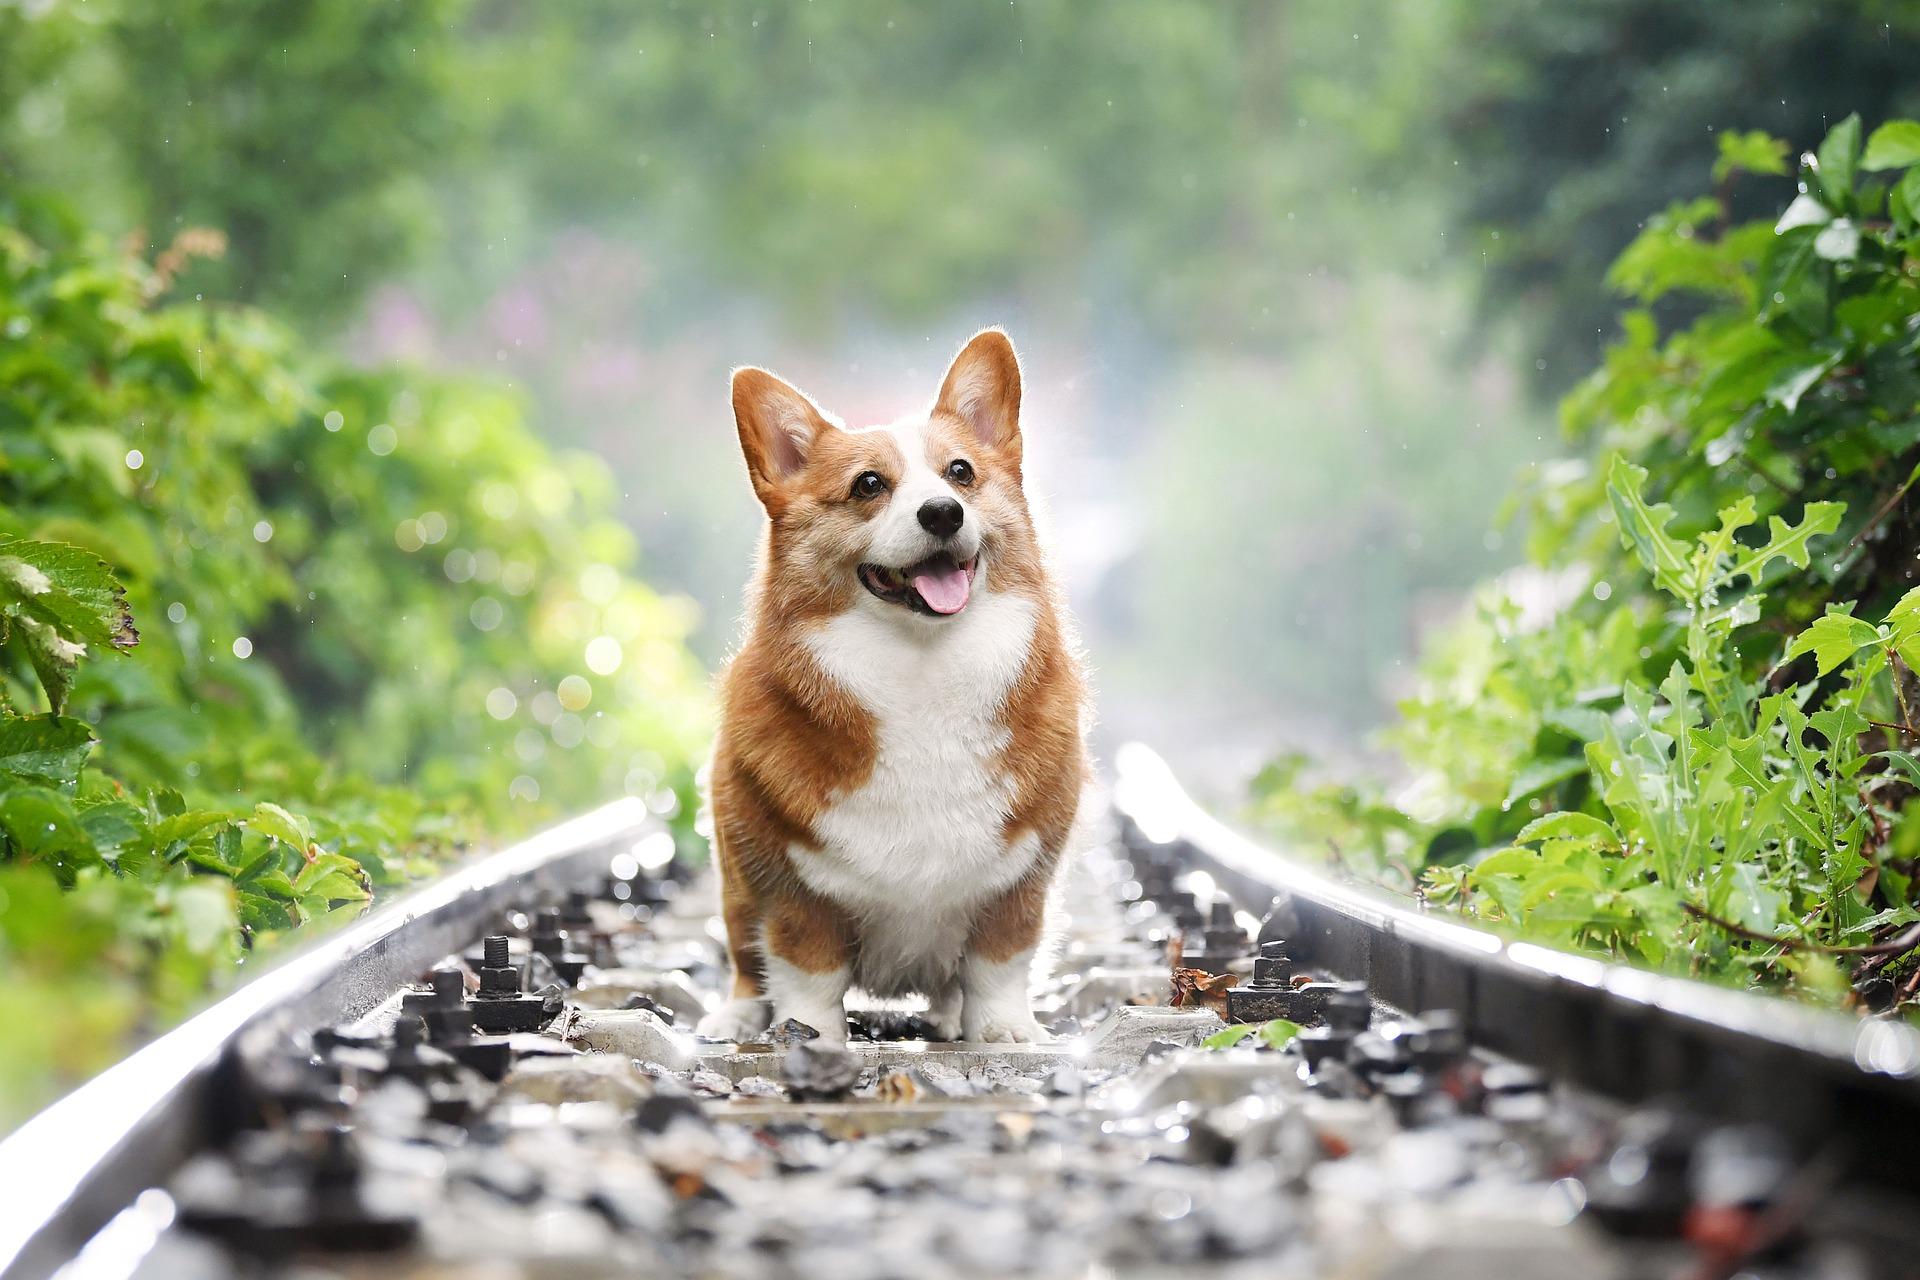 A happy Corgi dog smiling while walking on old railroad tracks.